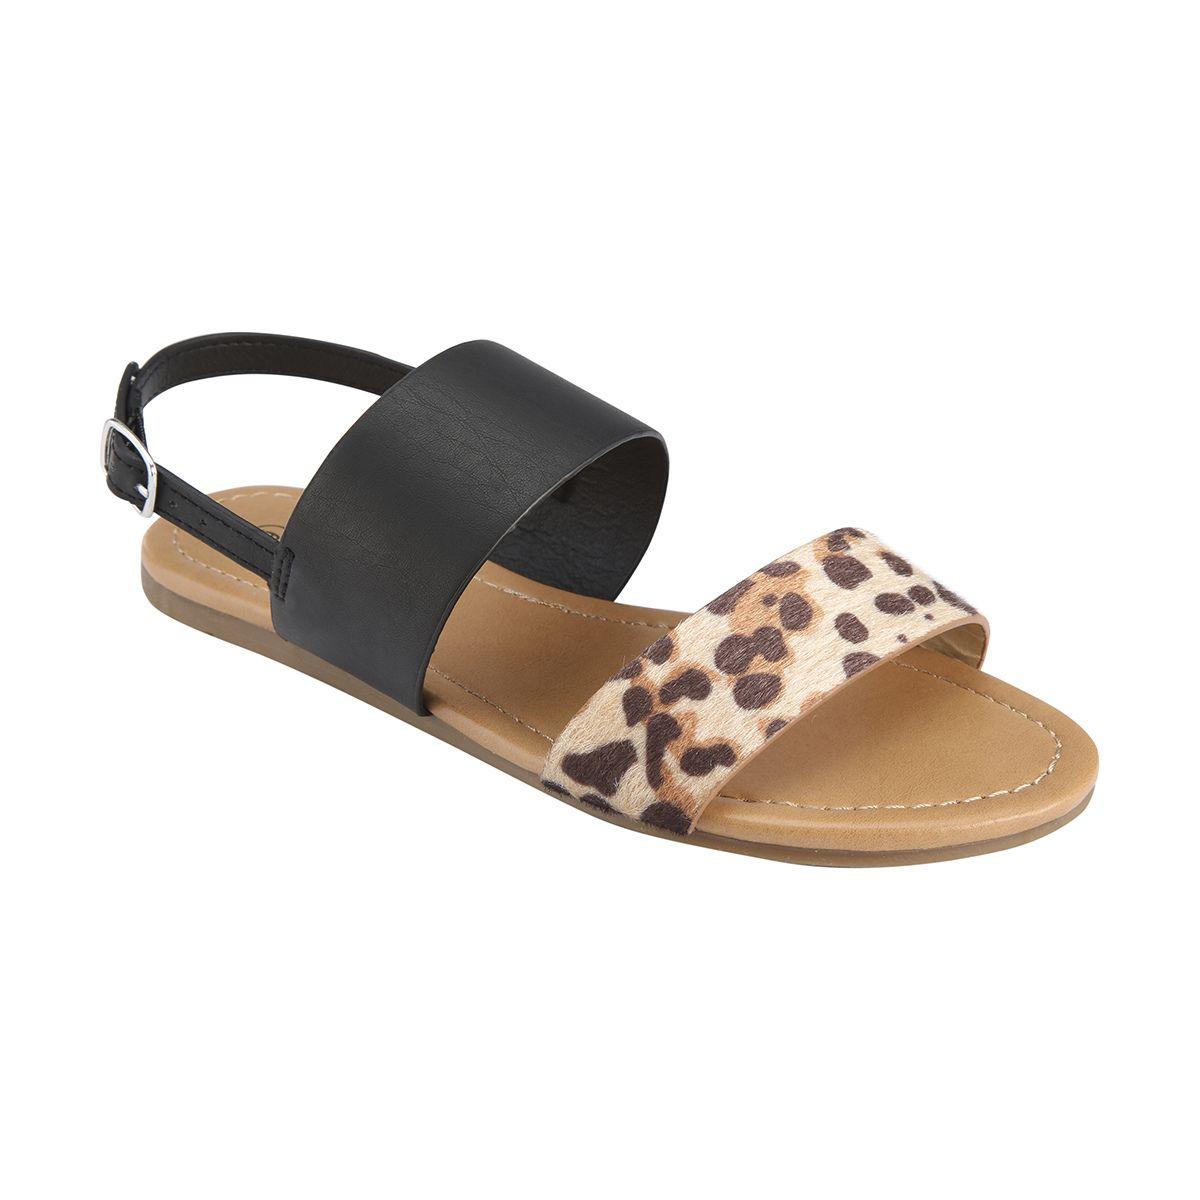 6bd1d9a037e  12 Sling Back Sandals